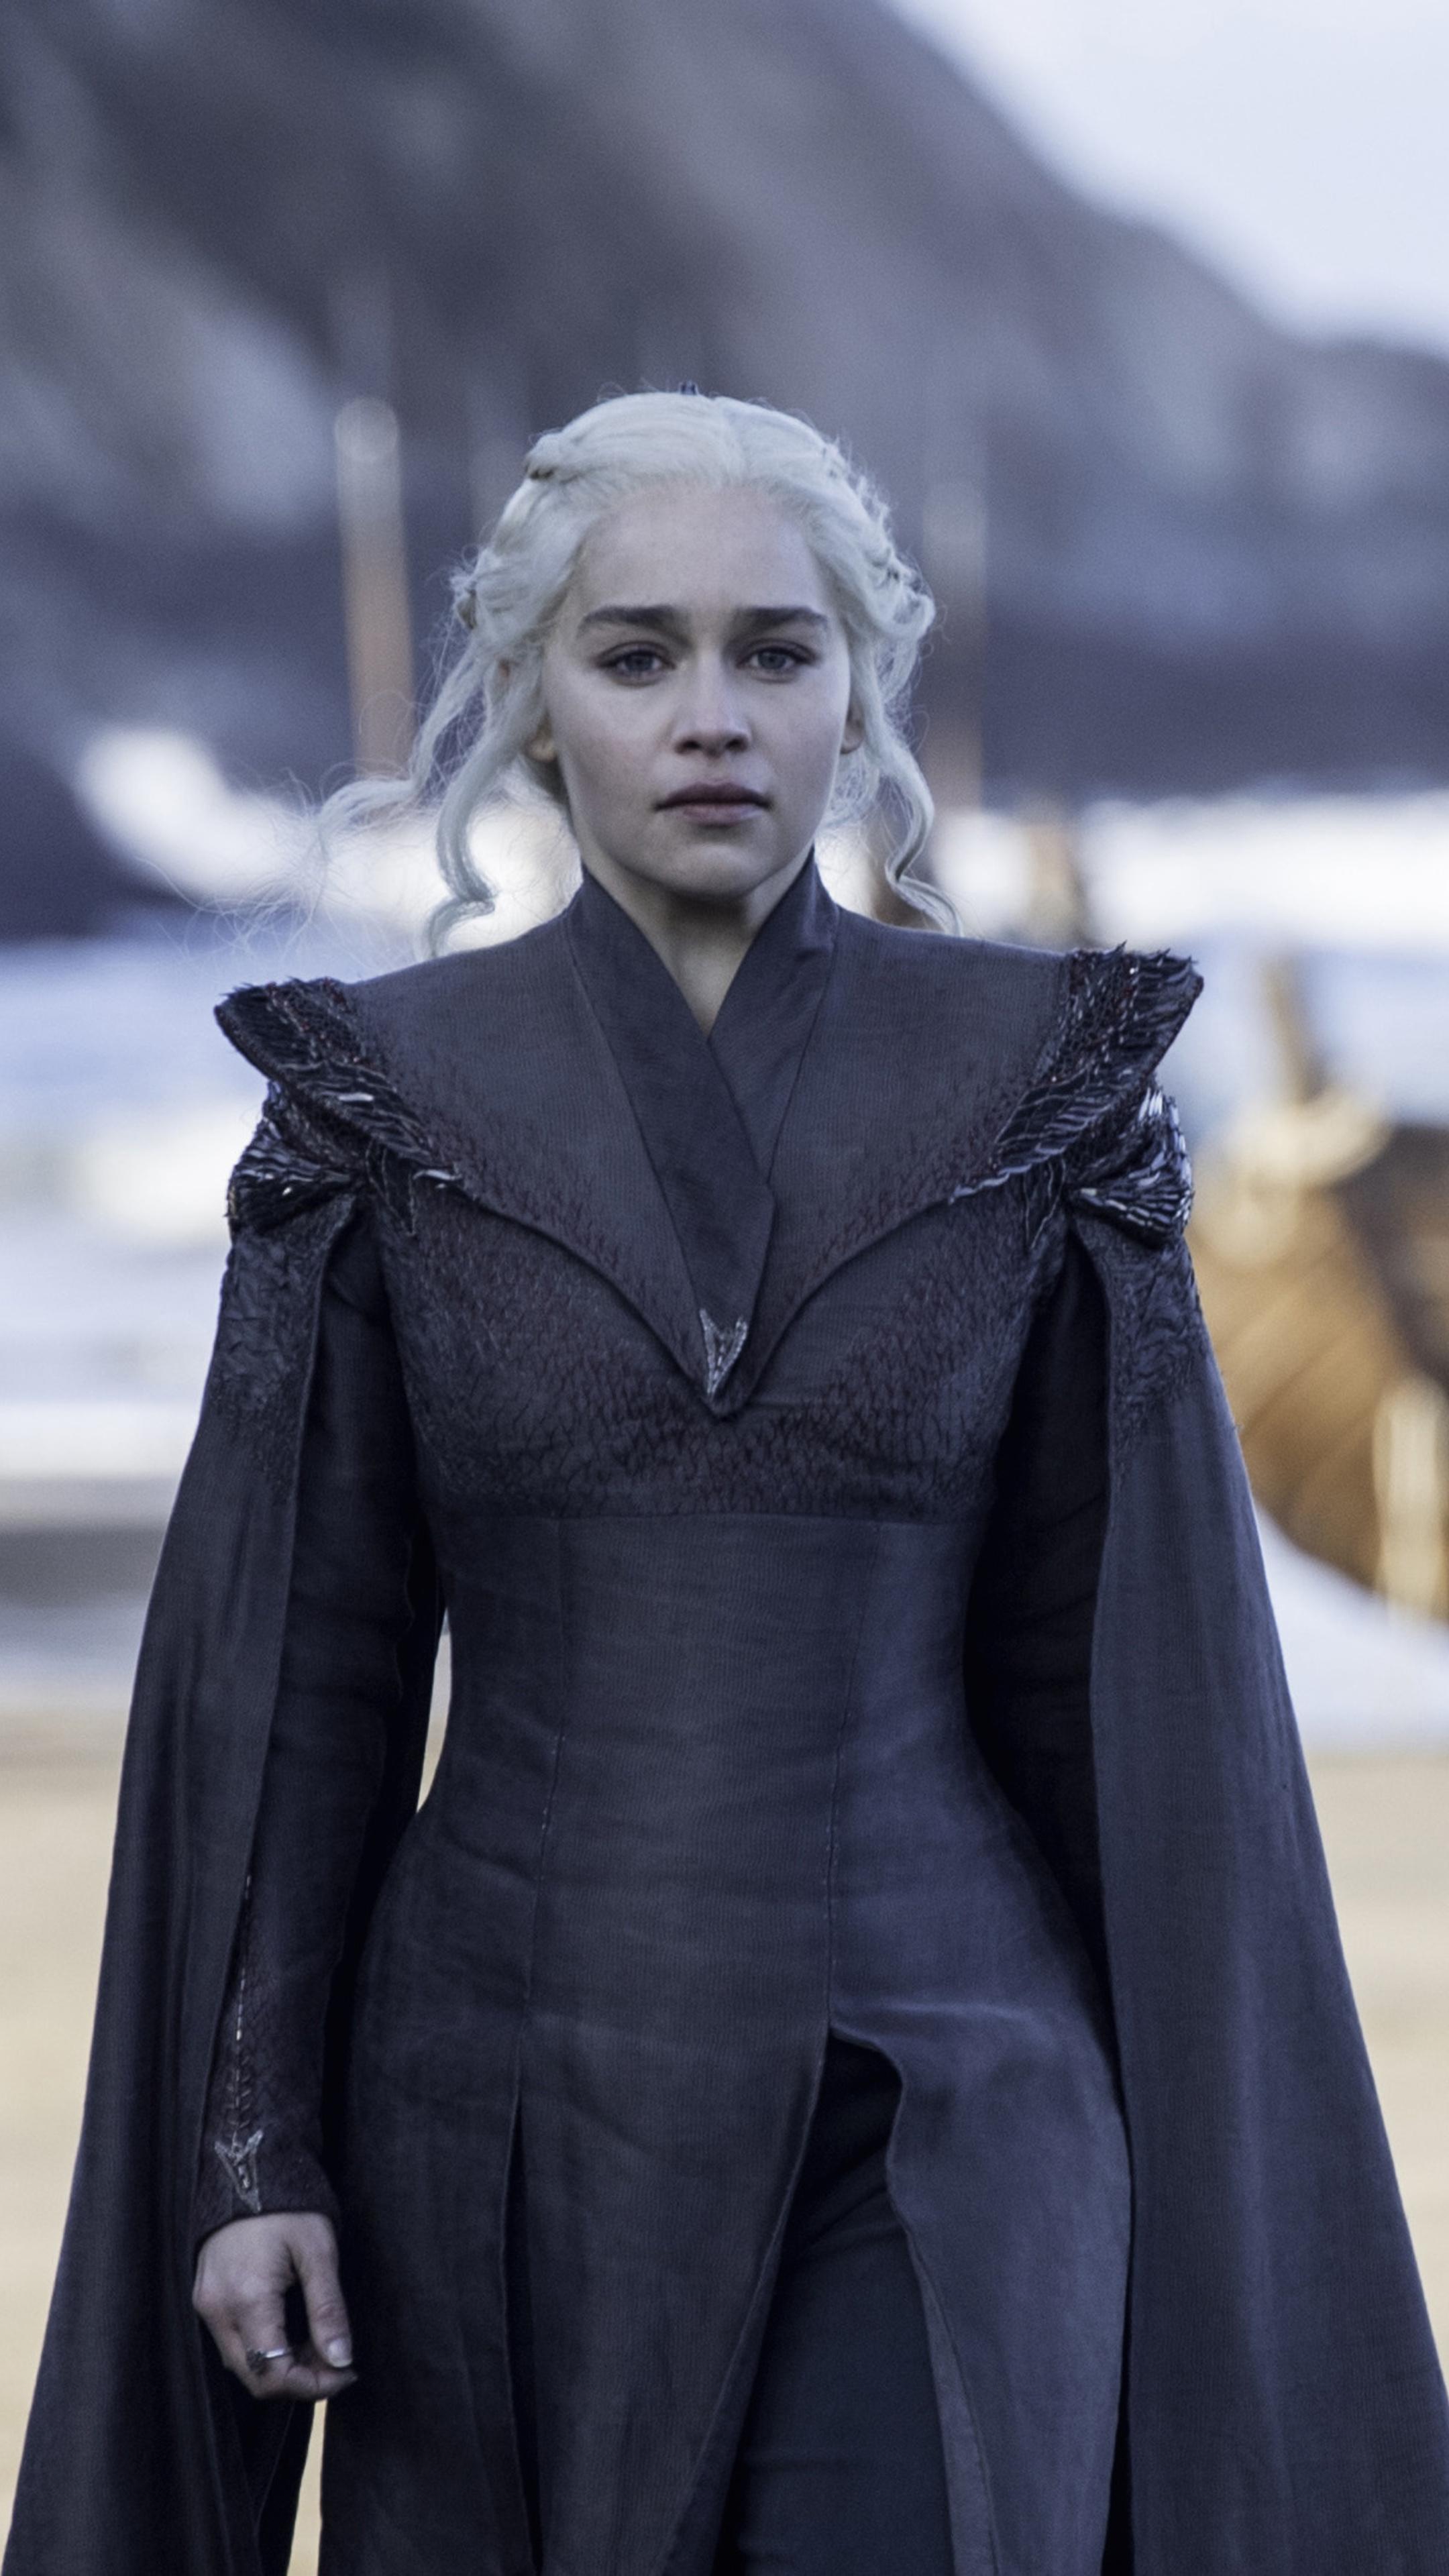 2160x3840 Emilia Clarke As Daenerys Targaryen In Game Of ...